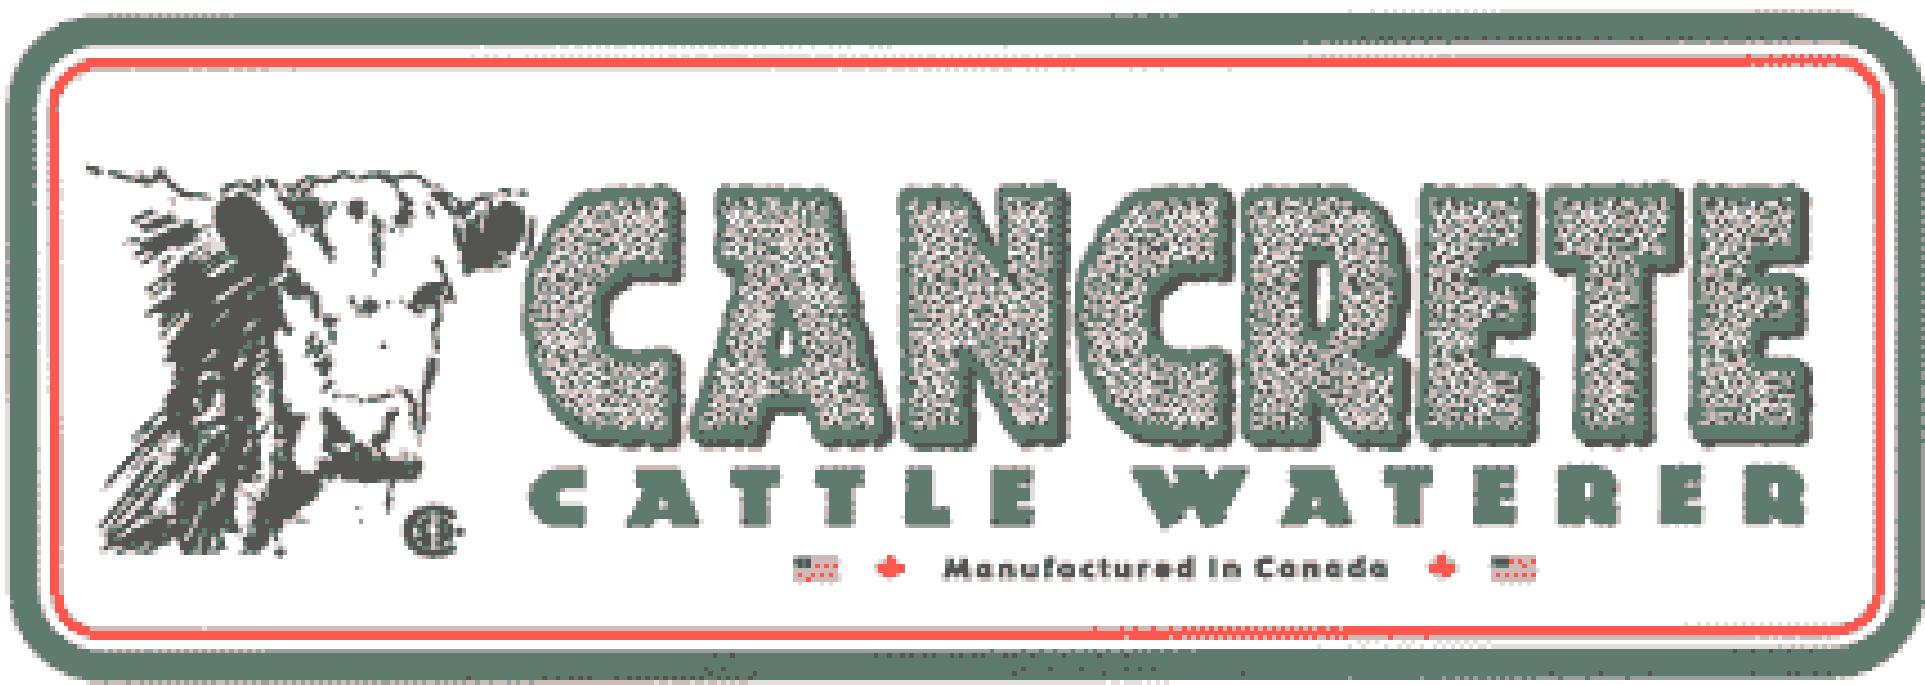 cancrete - web sponsor